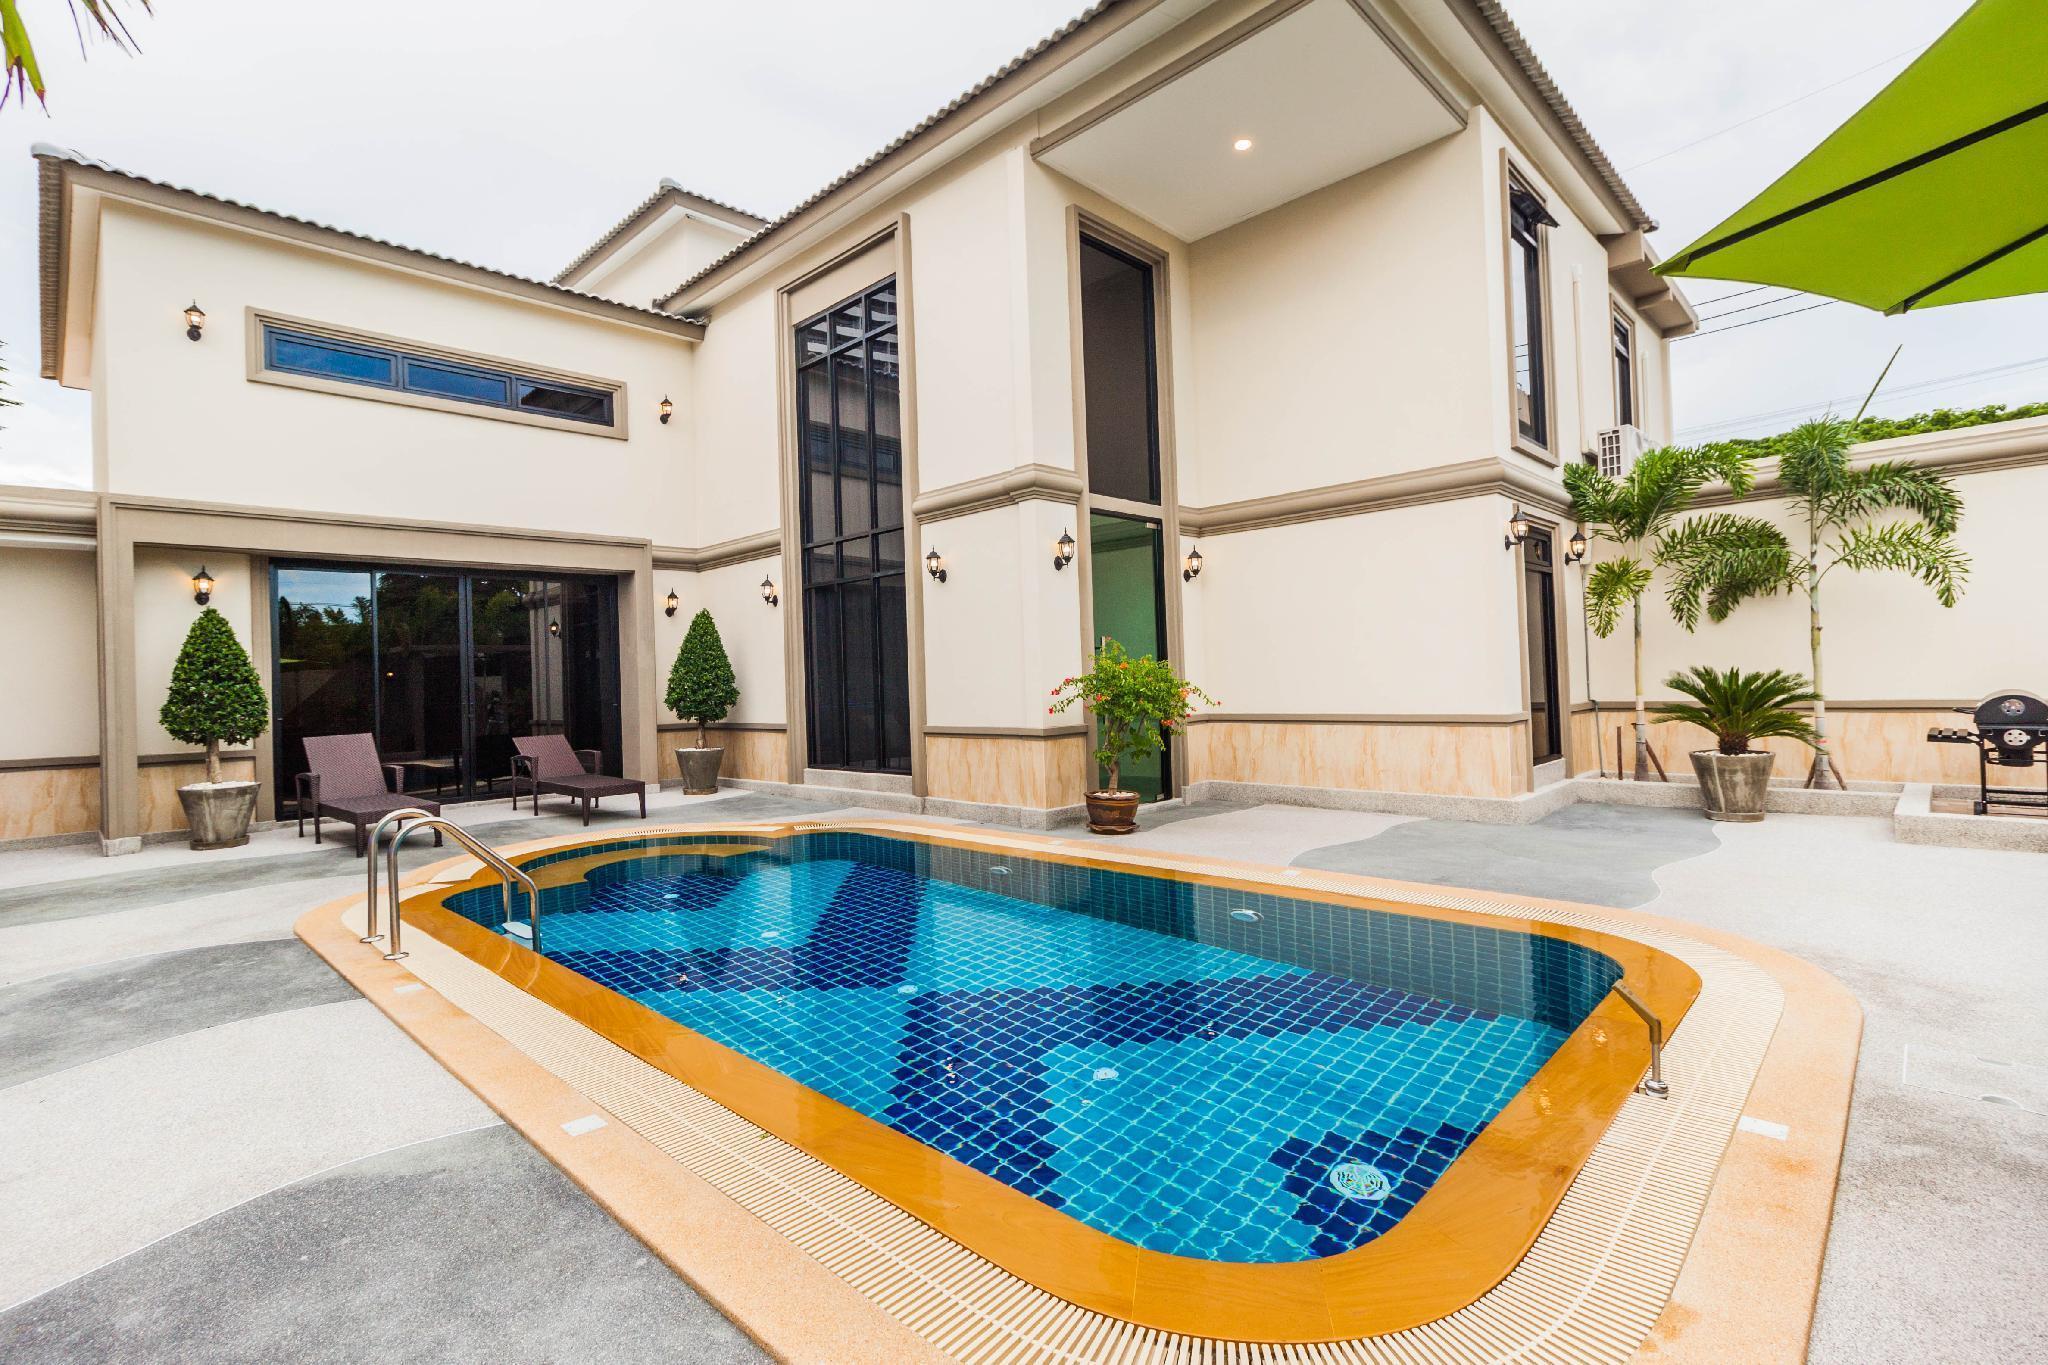 Top Pool Villa  Pattaya ท็อป พูล วิลลา พัทยา